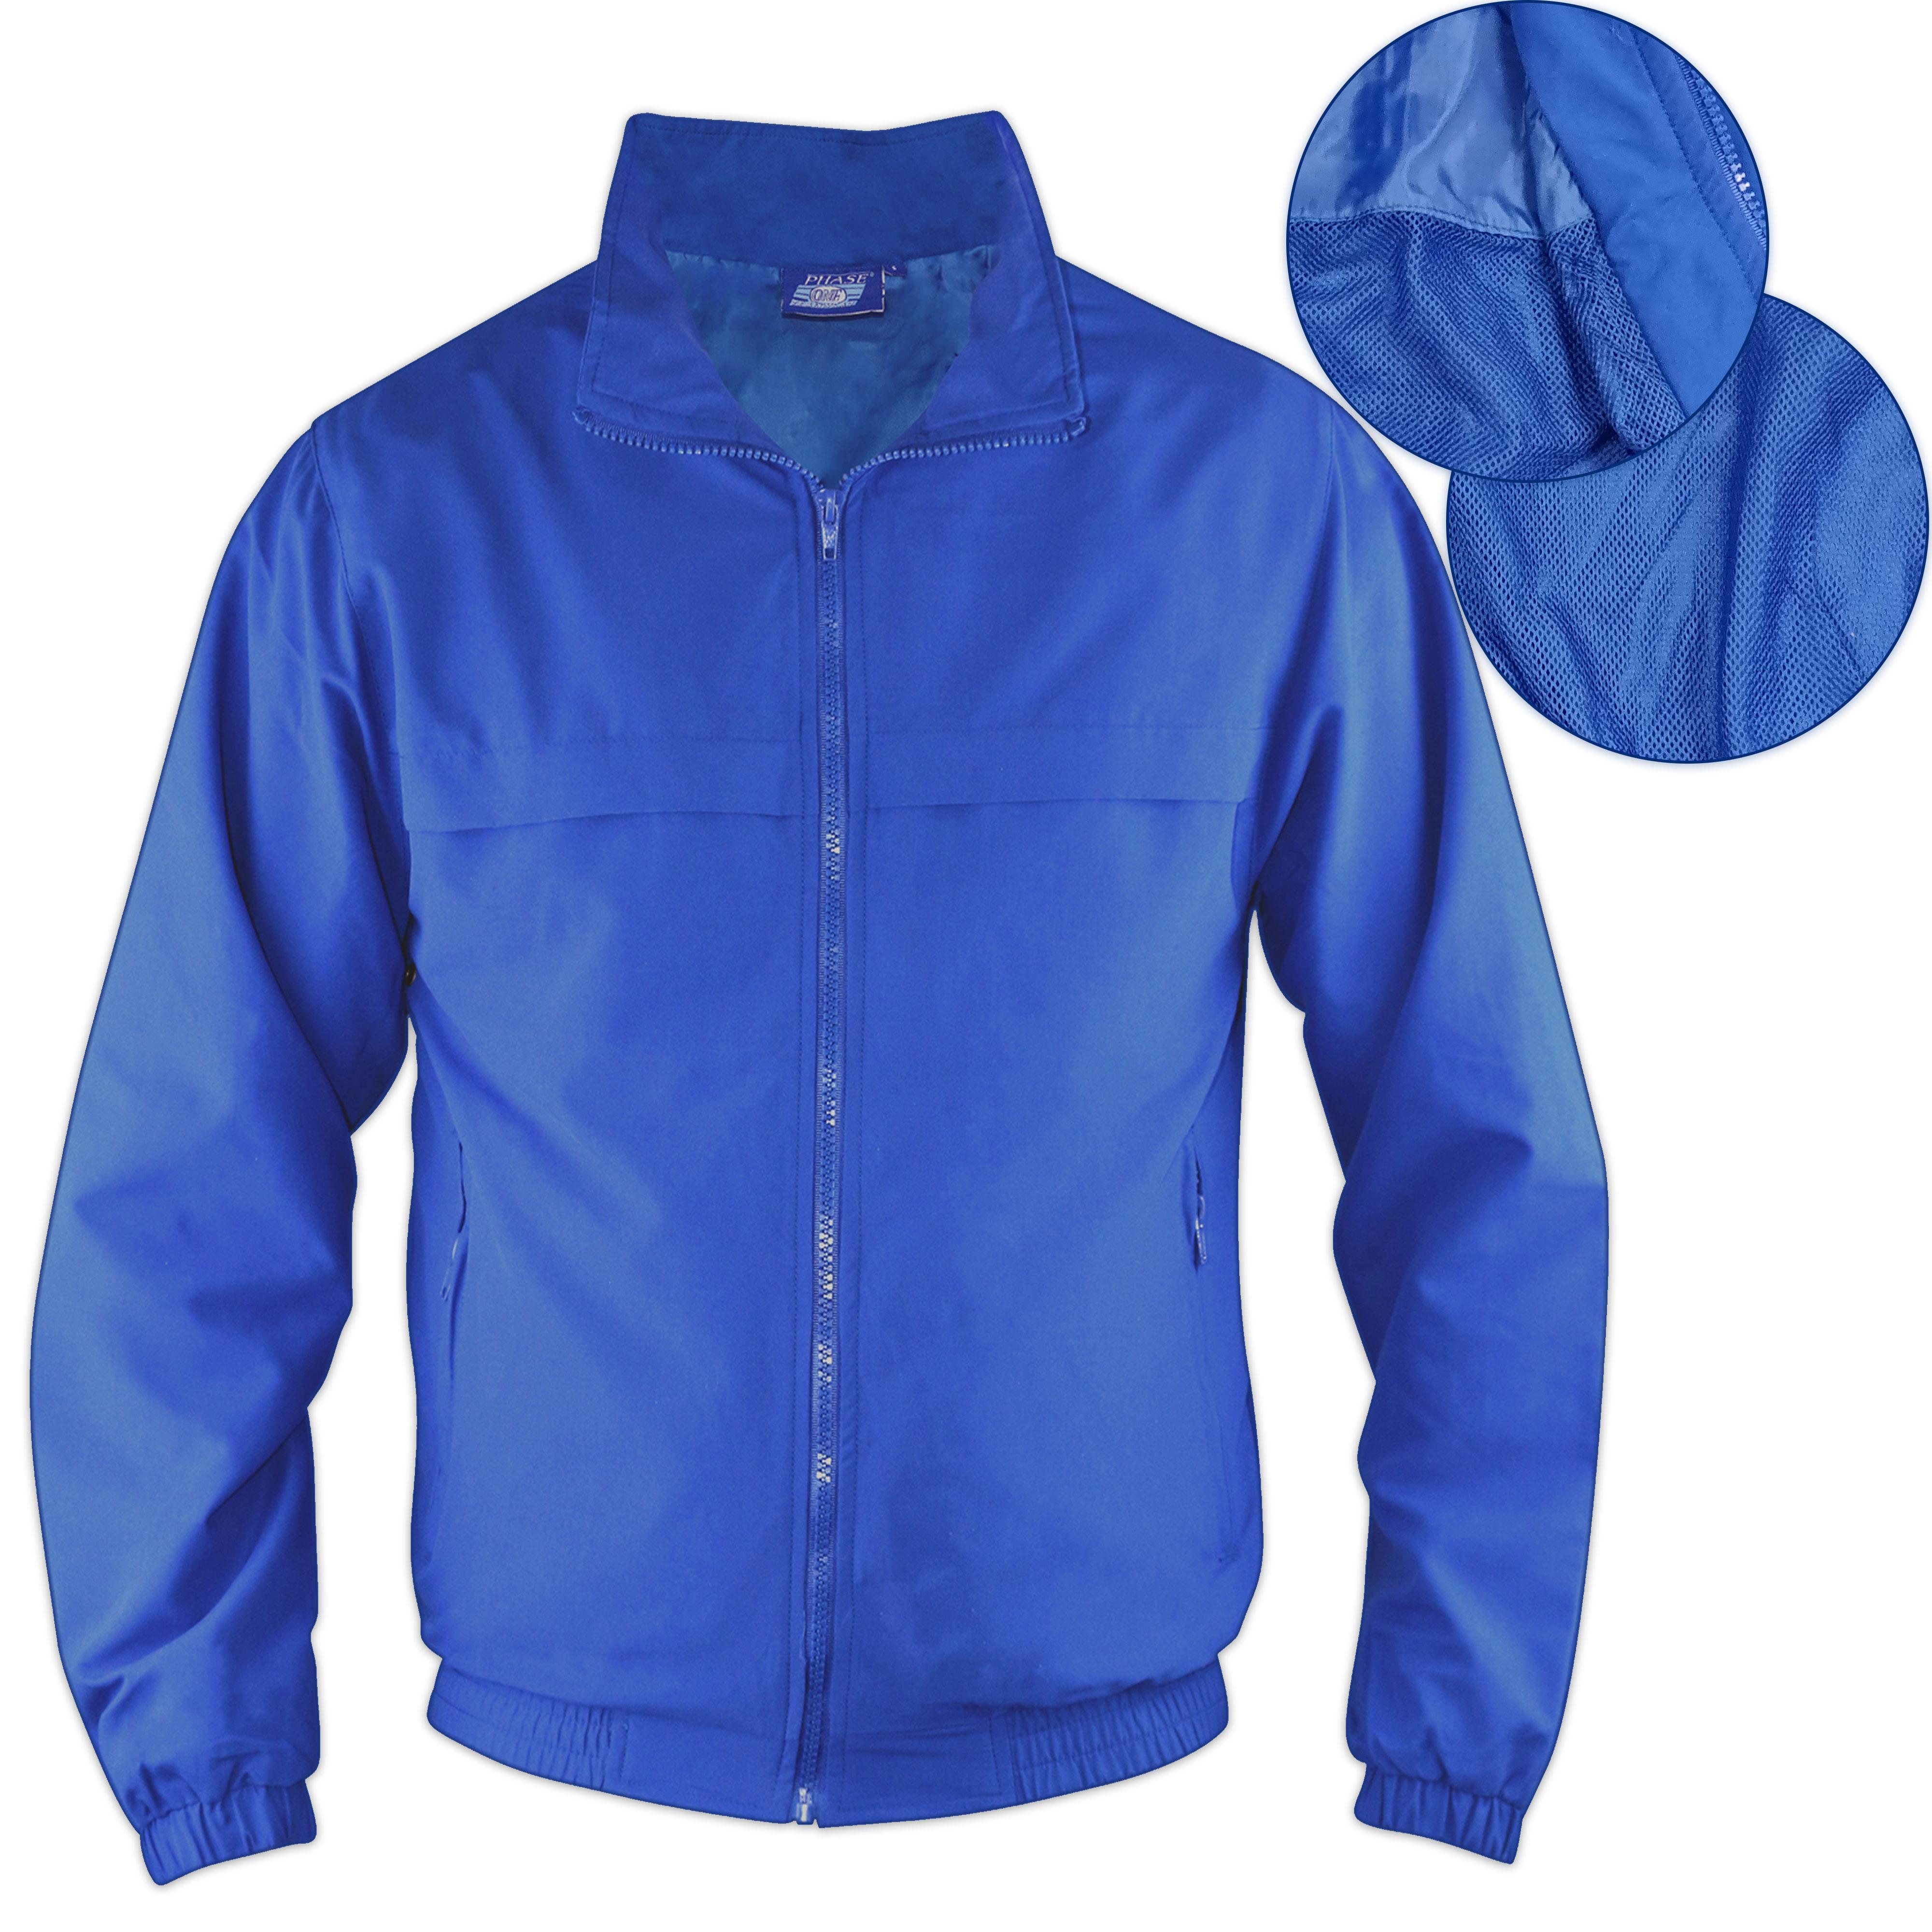 Boys Kids Waterproof Tracksuit Jacket Coat Trousers Pants Set Outdoor Camping